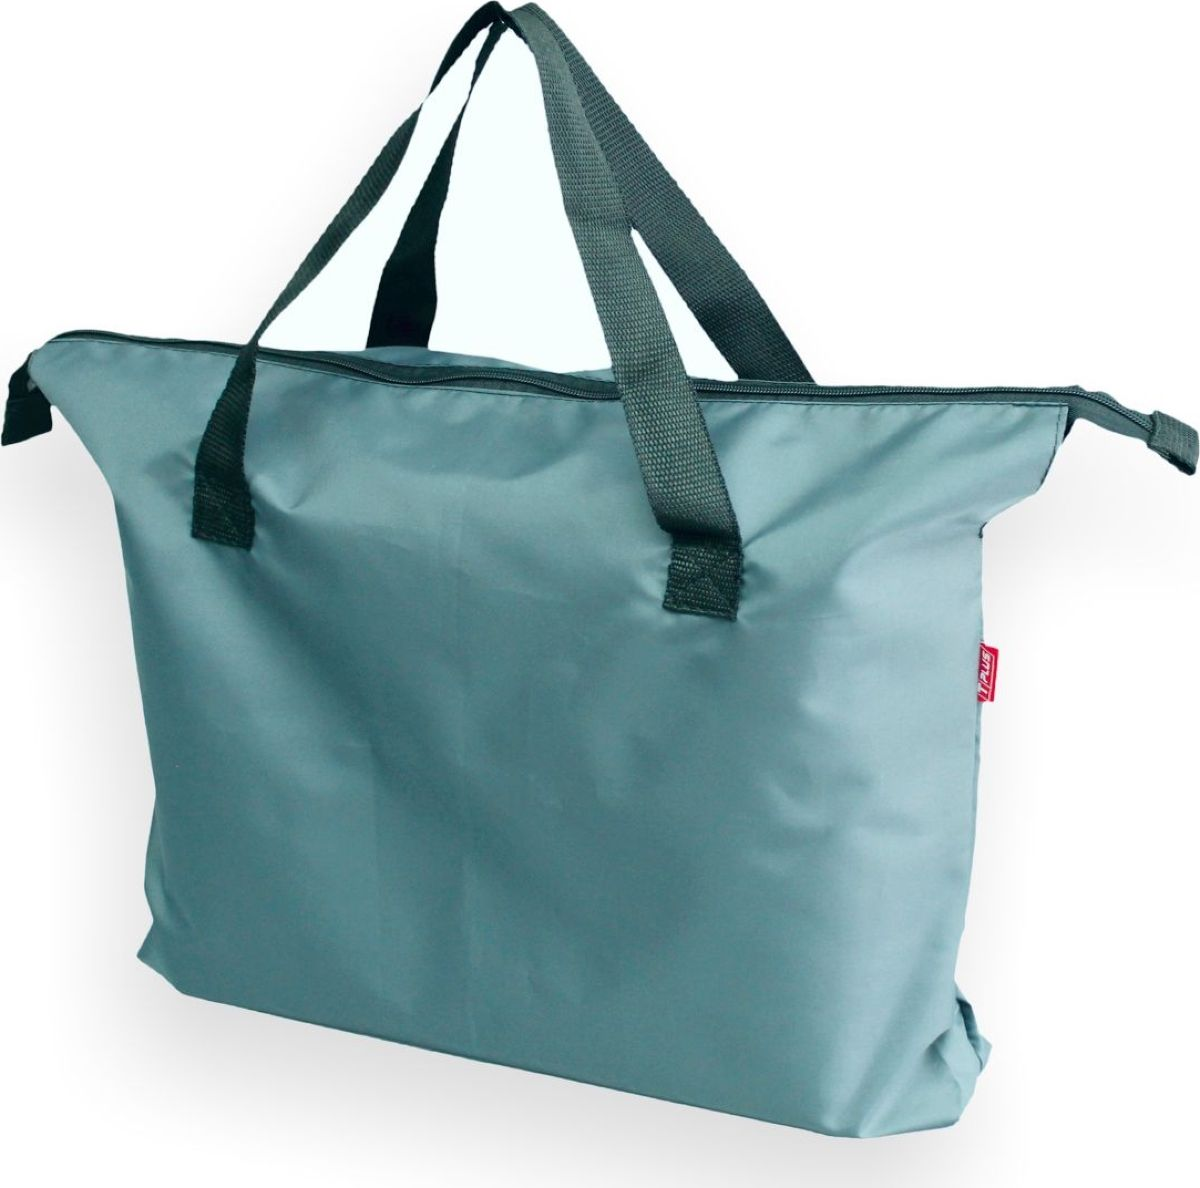 Сумка-тоут Tplus 240, цвет: серый spark man spaceman мужская сумка для мешка маленькая сумка для мужчин сумка сумка для сумок сумка из нейлоновой ткани 5008 04 серый